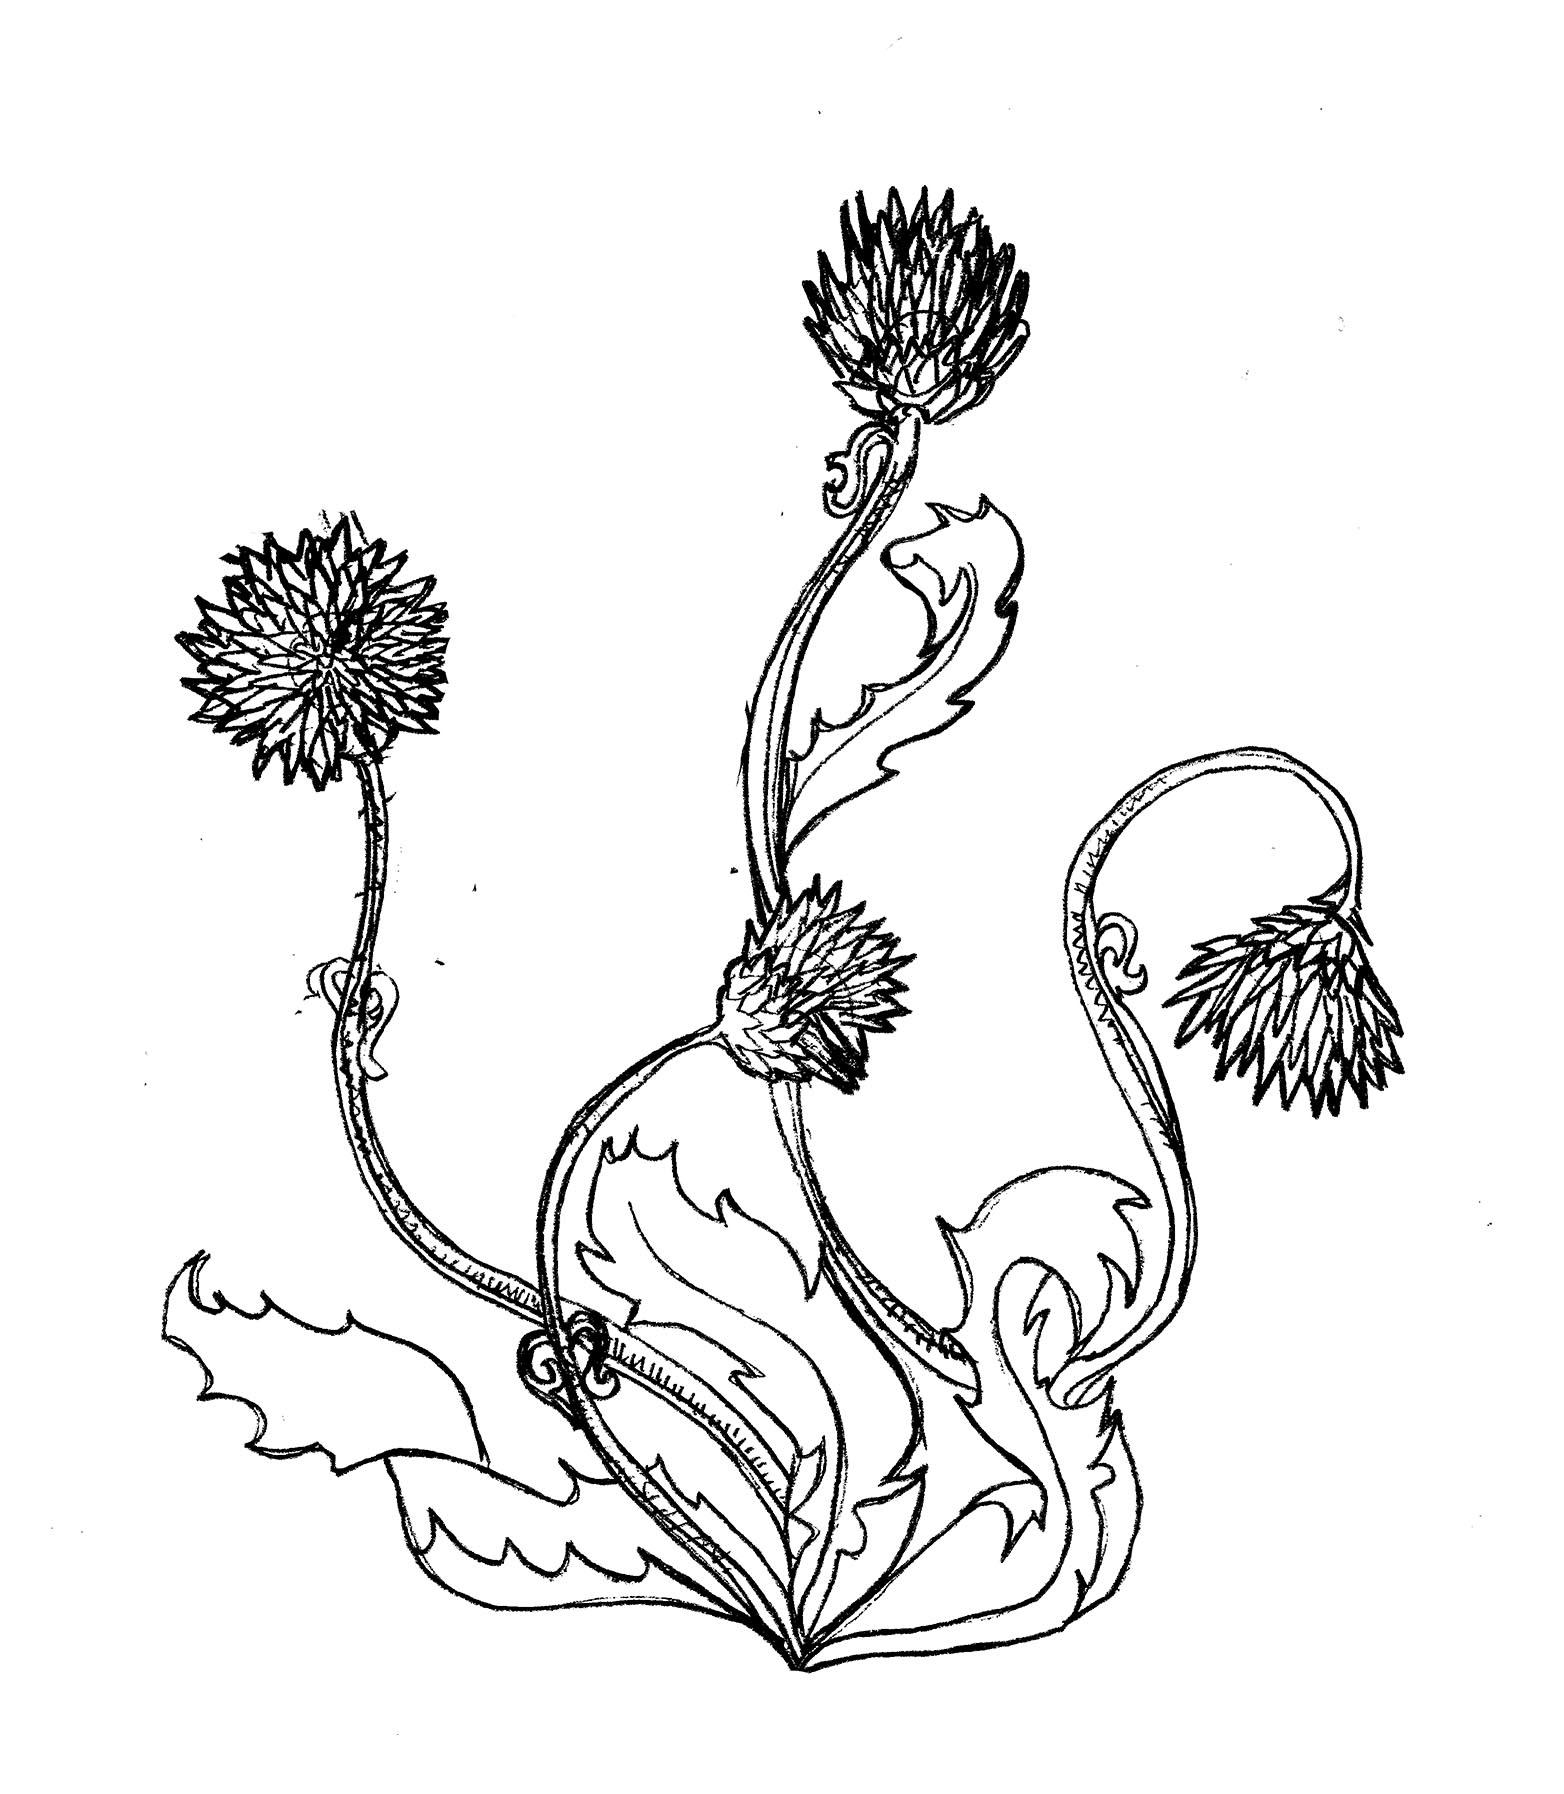 tobycurden_illustration_thistle small.jpg